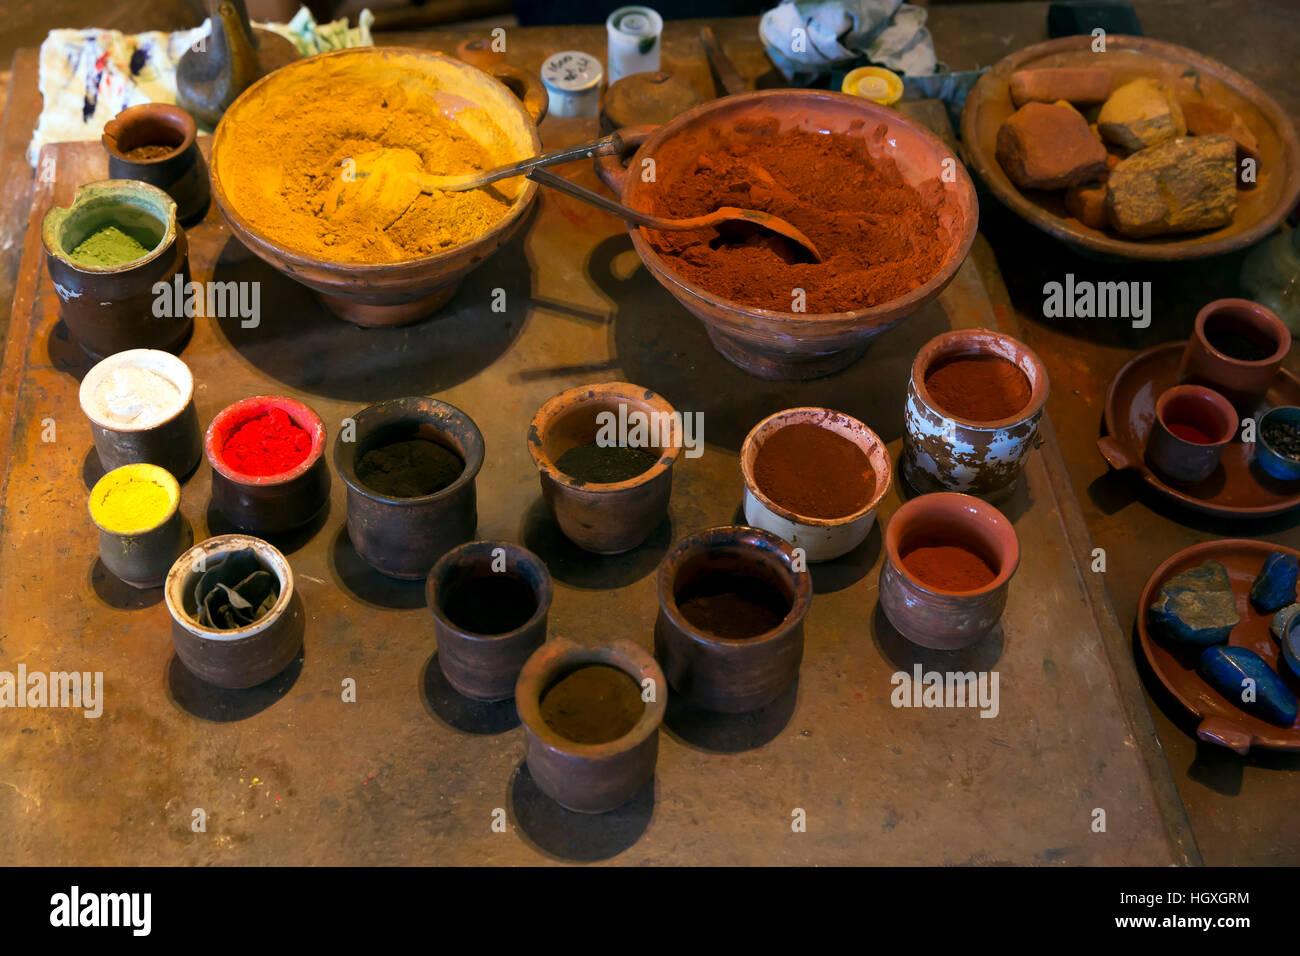 Ölfarbe Vorbereitung, Rembrandt House Museum, rembrandthuis, Amsterdam, Niederlande. Stockbild